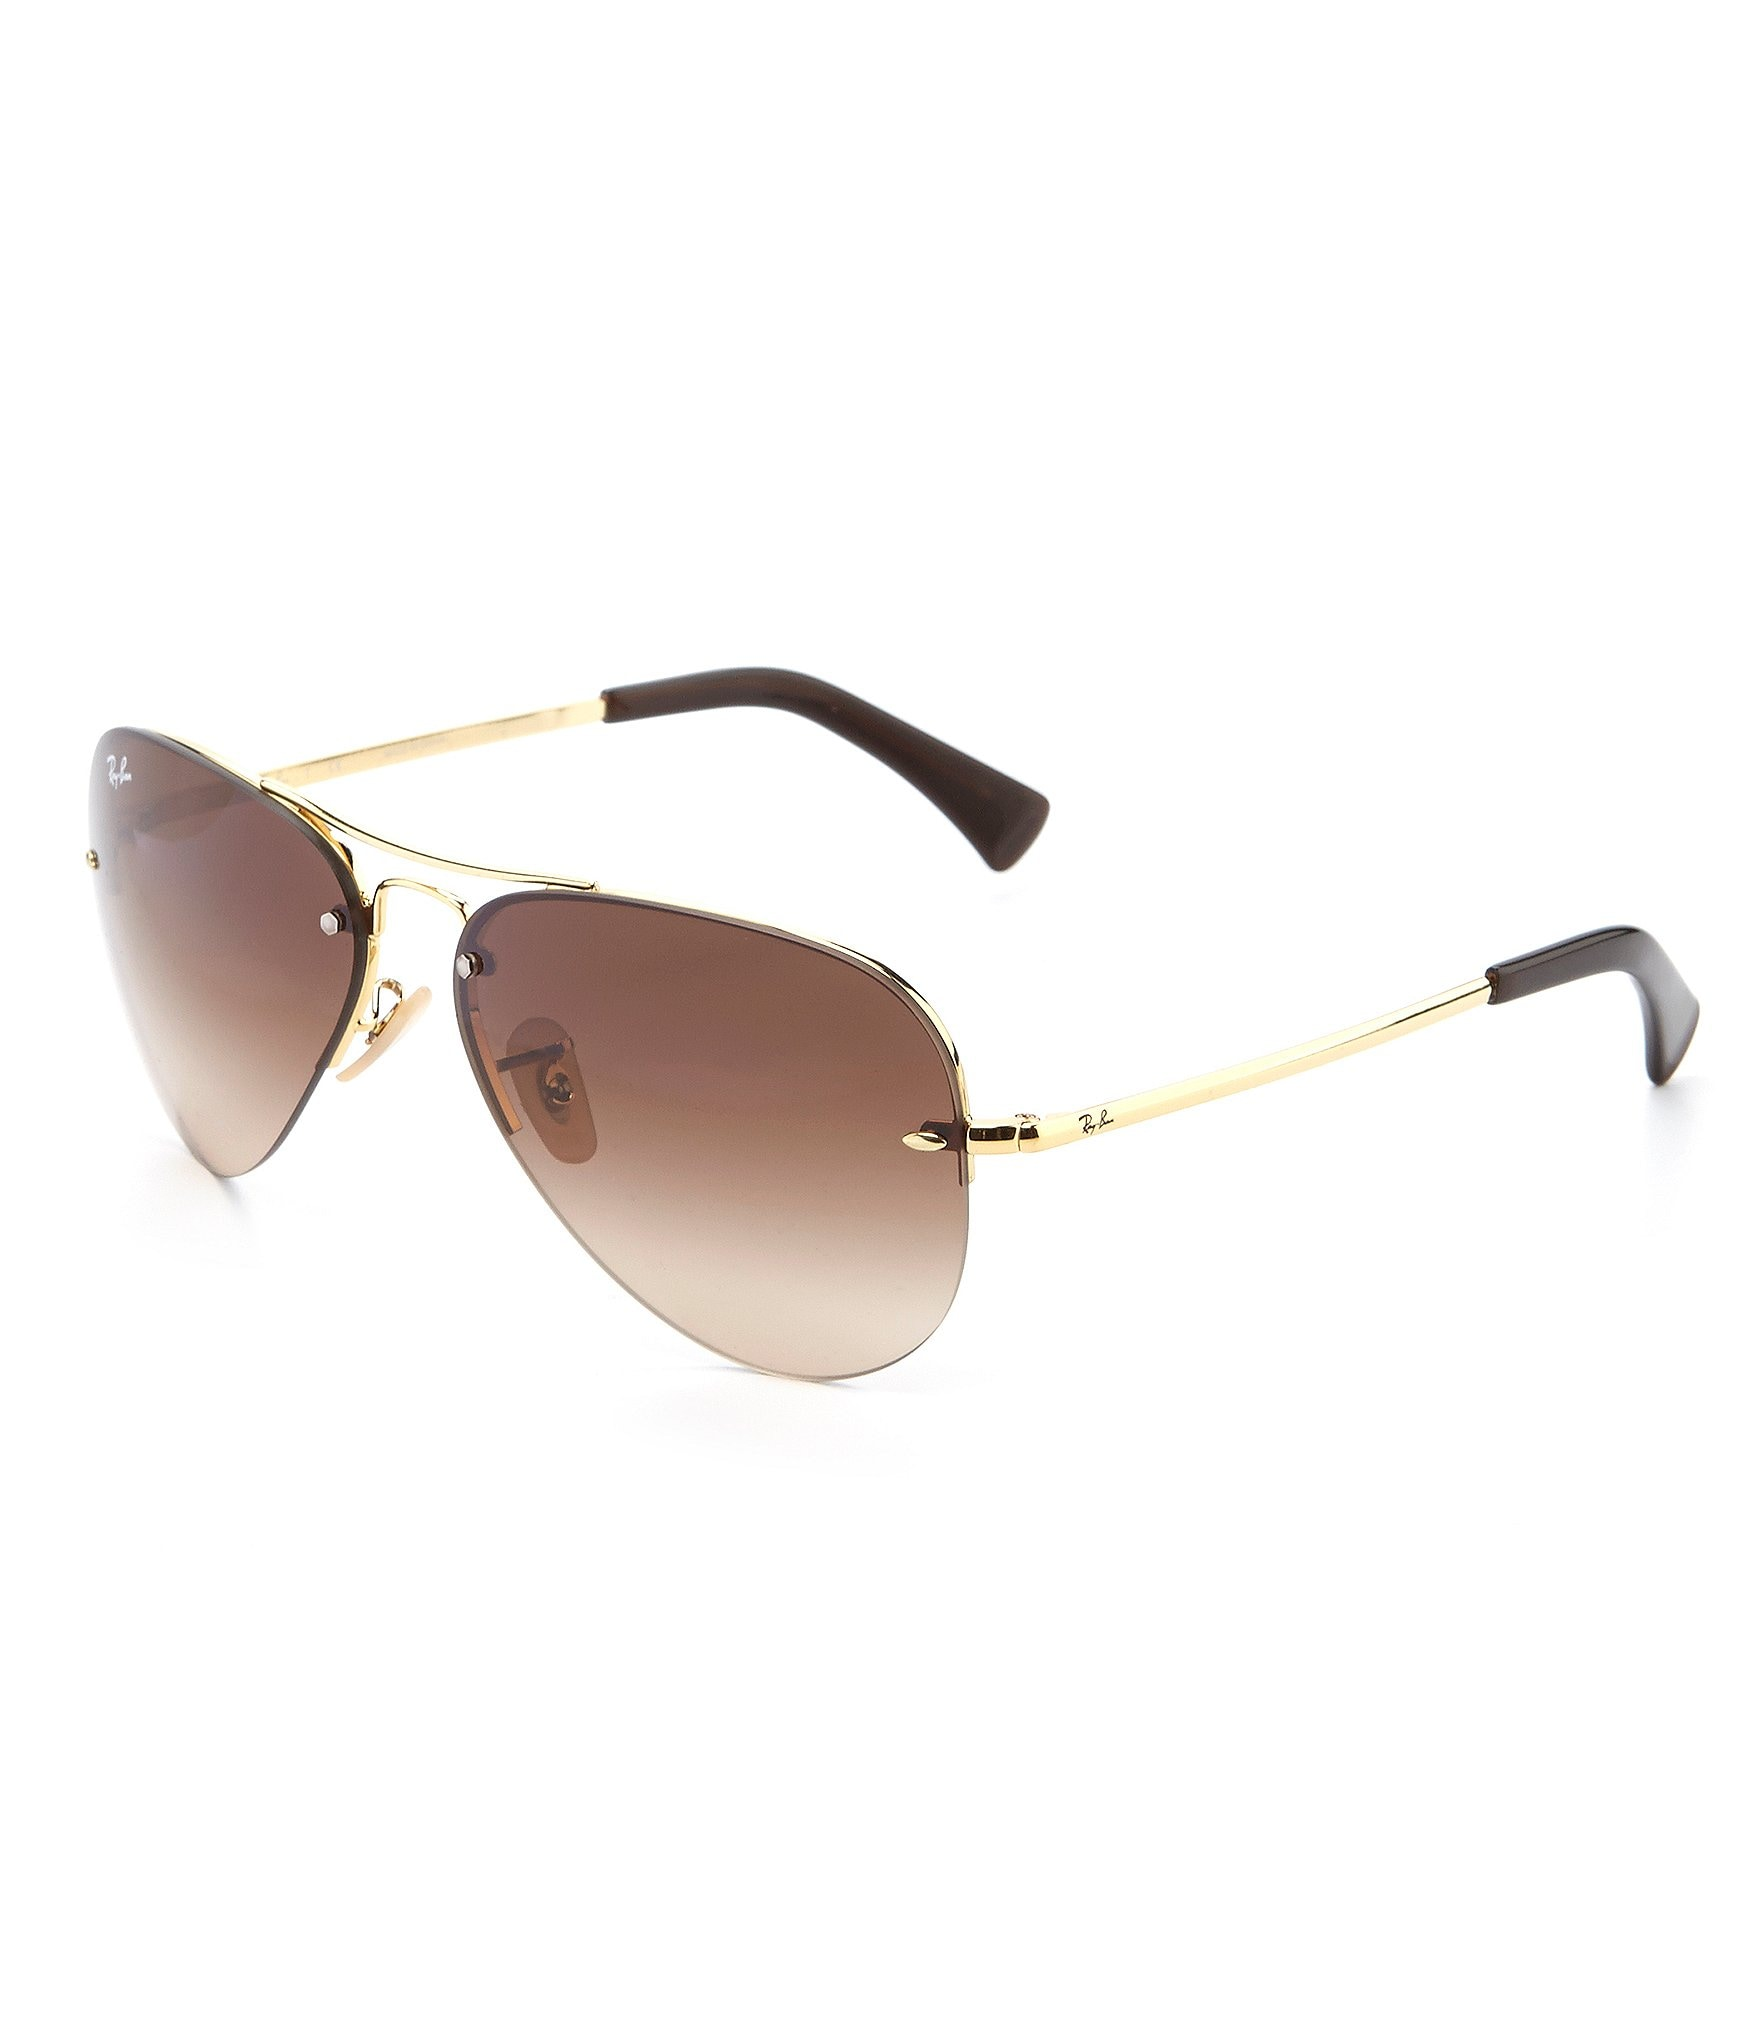 05076d17062 Ray-Ban Men s Sunglasses   Eyewear